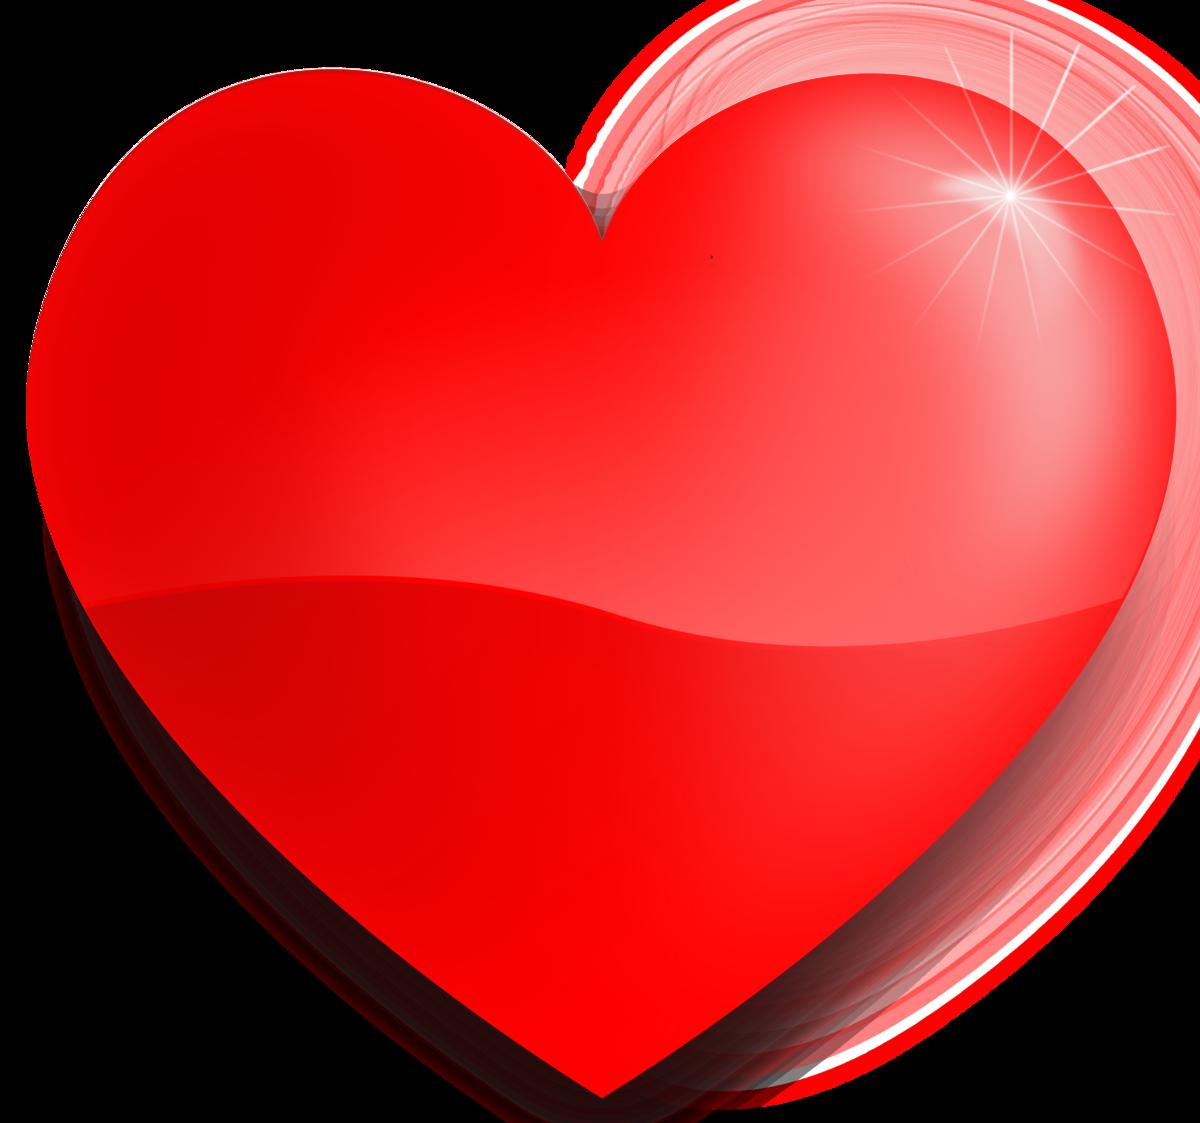 Картинки сердец